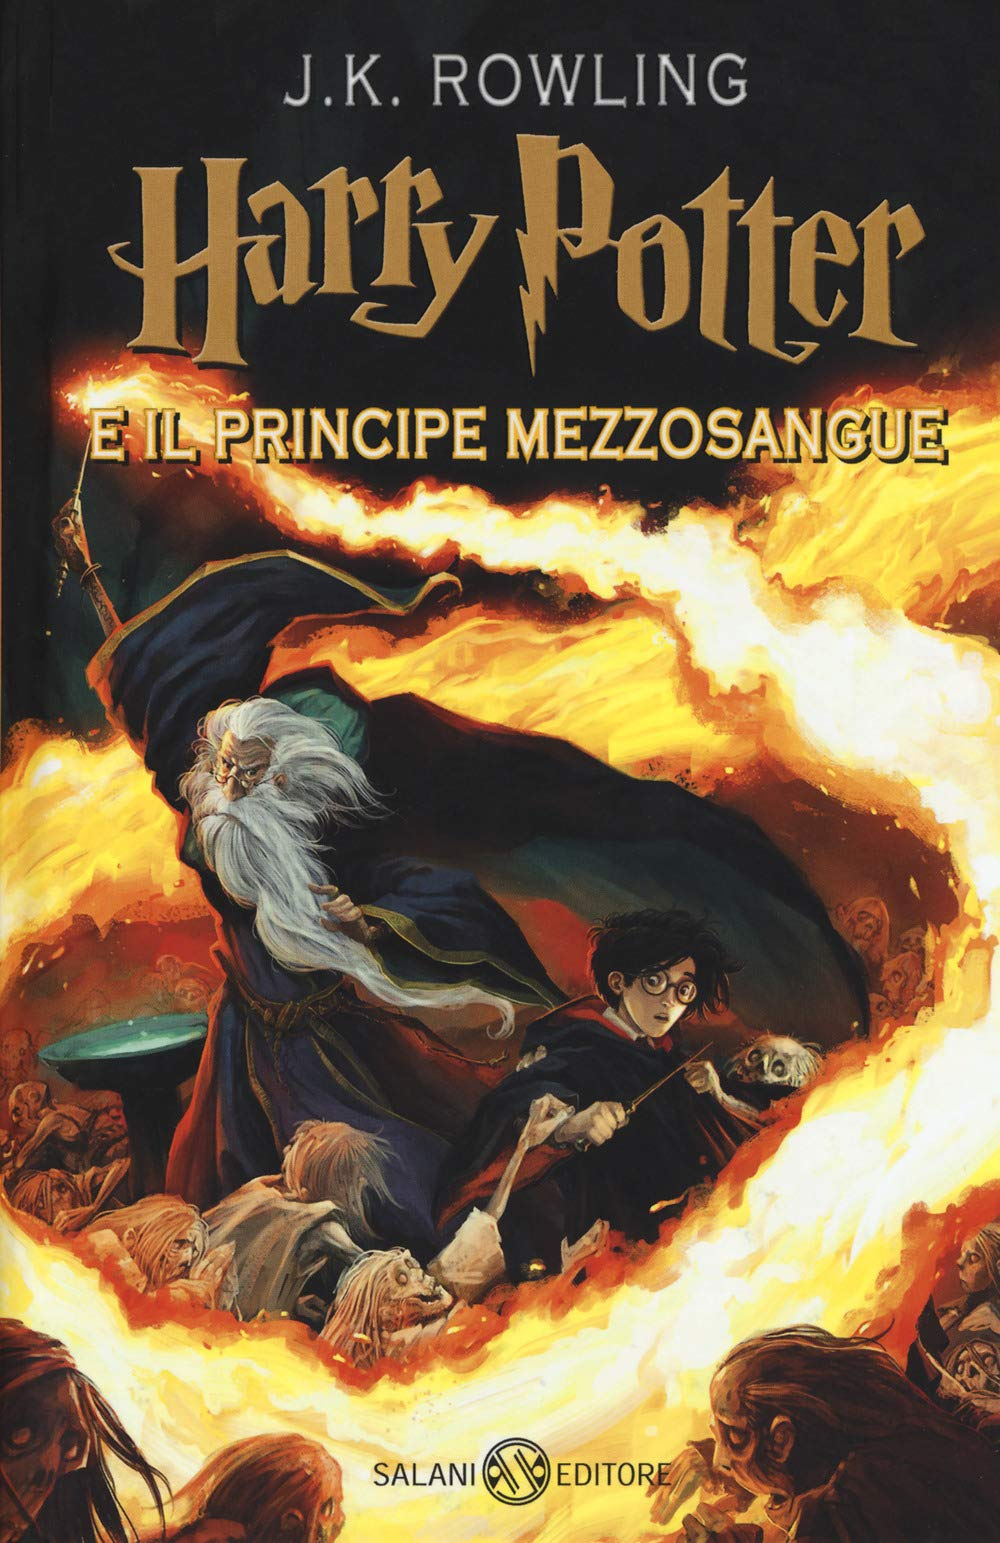 Harry Potter e il Principe Mezzosangue JONNY DUDDLE 2020